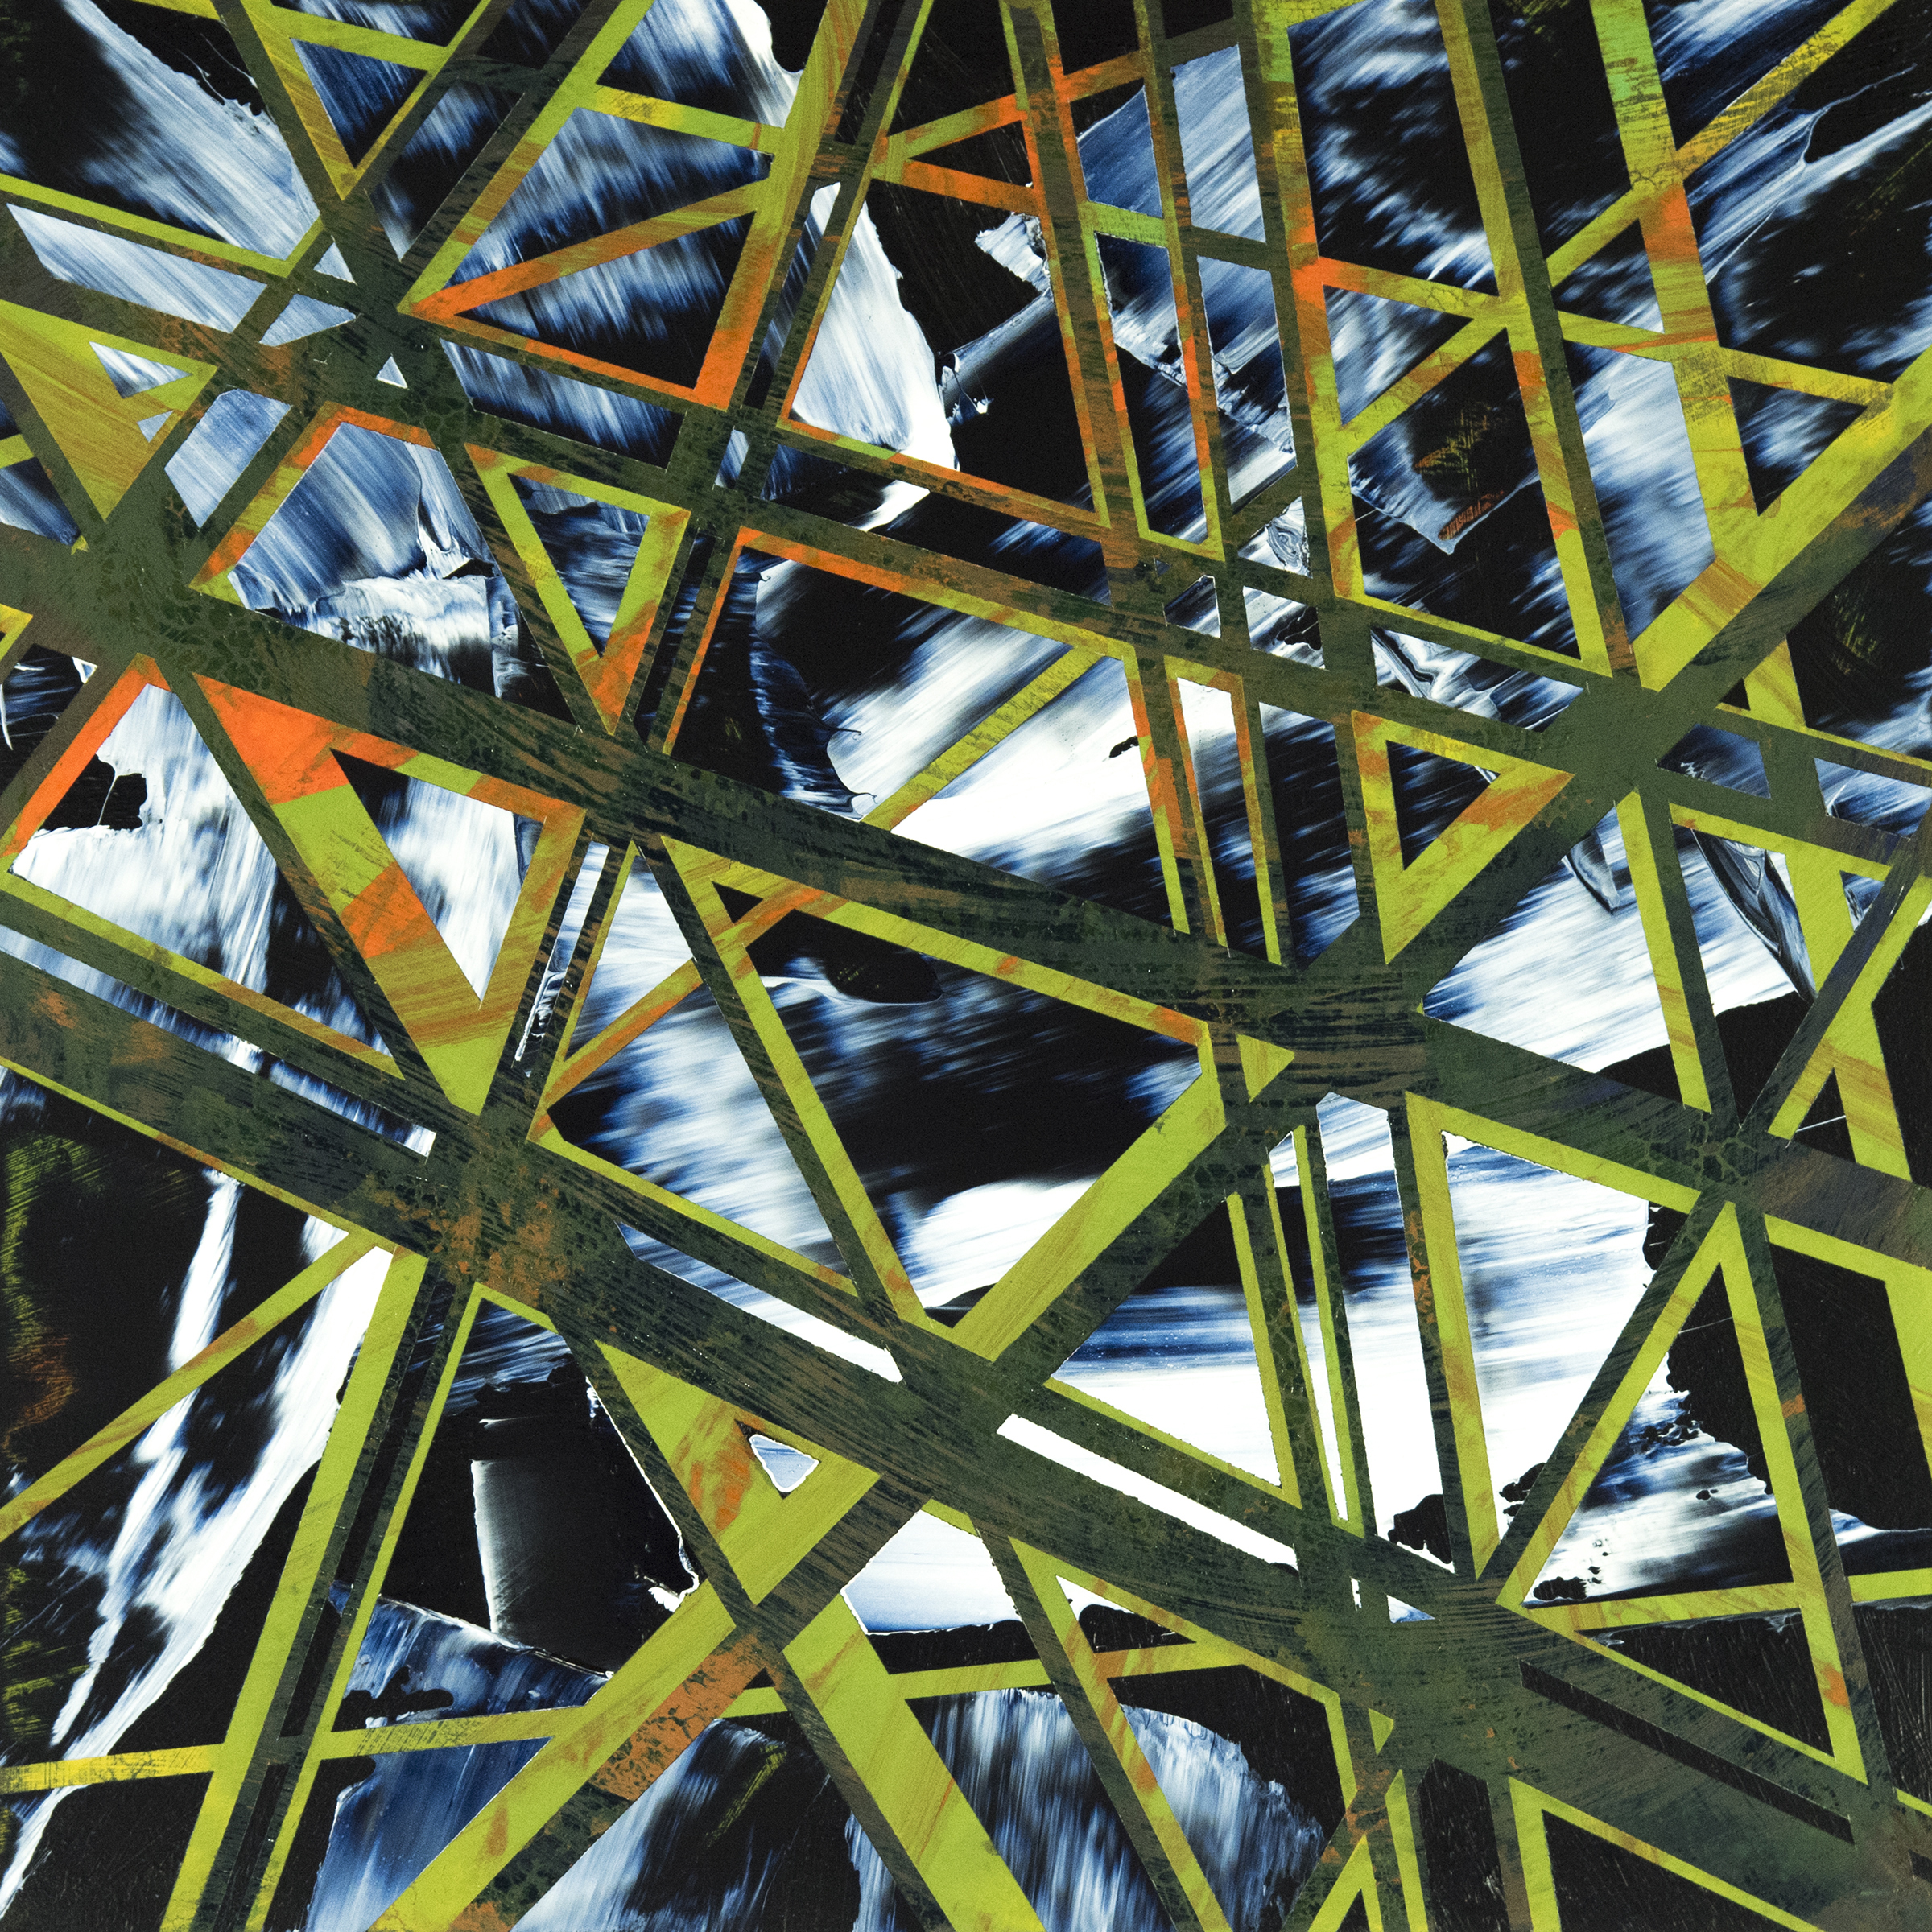 Daniel_Stuelpnagel-_Evolutionary_Convergence_-18x18_-acryliconwoodpanel-2018-$700.jpg